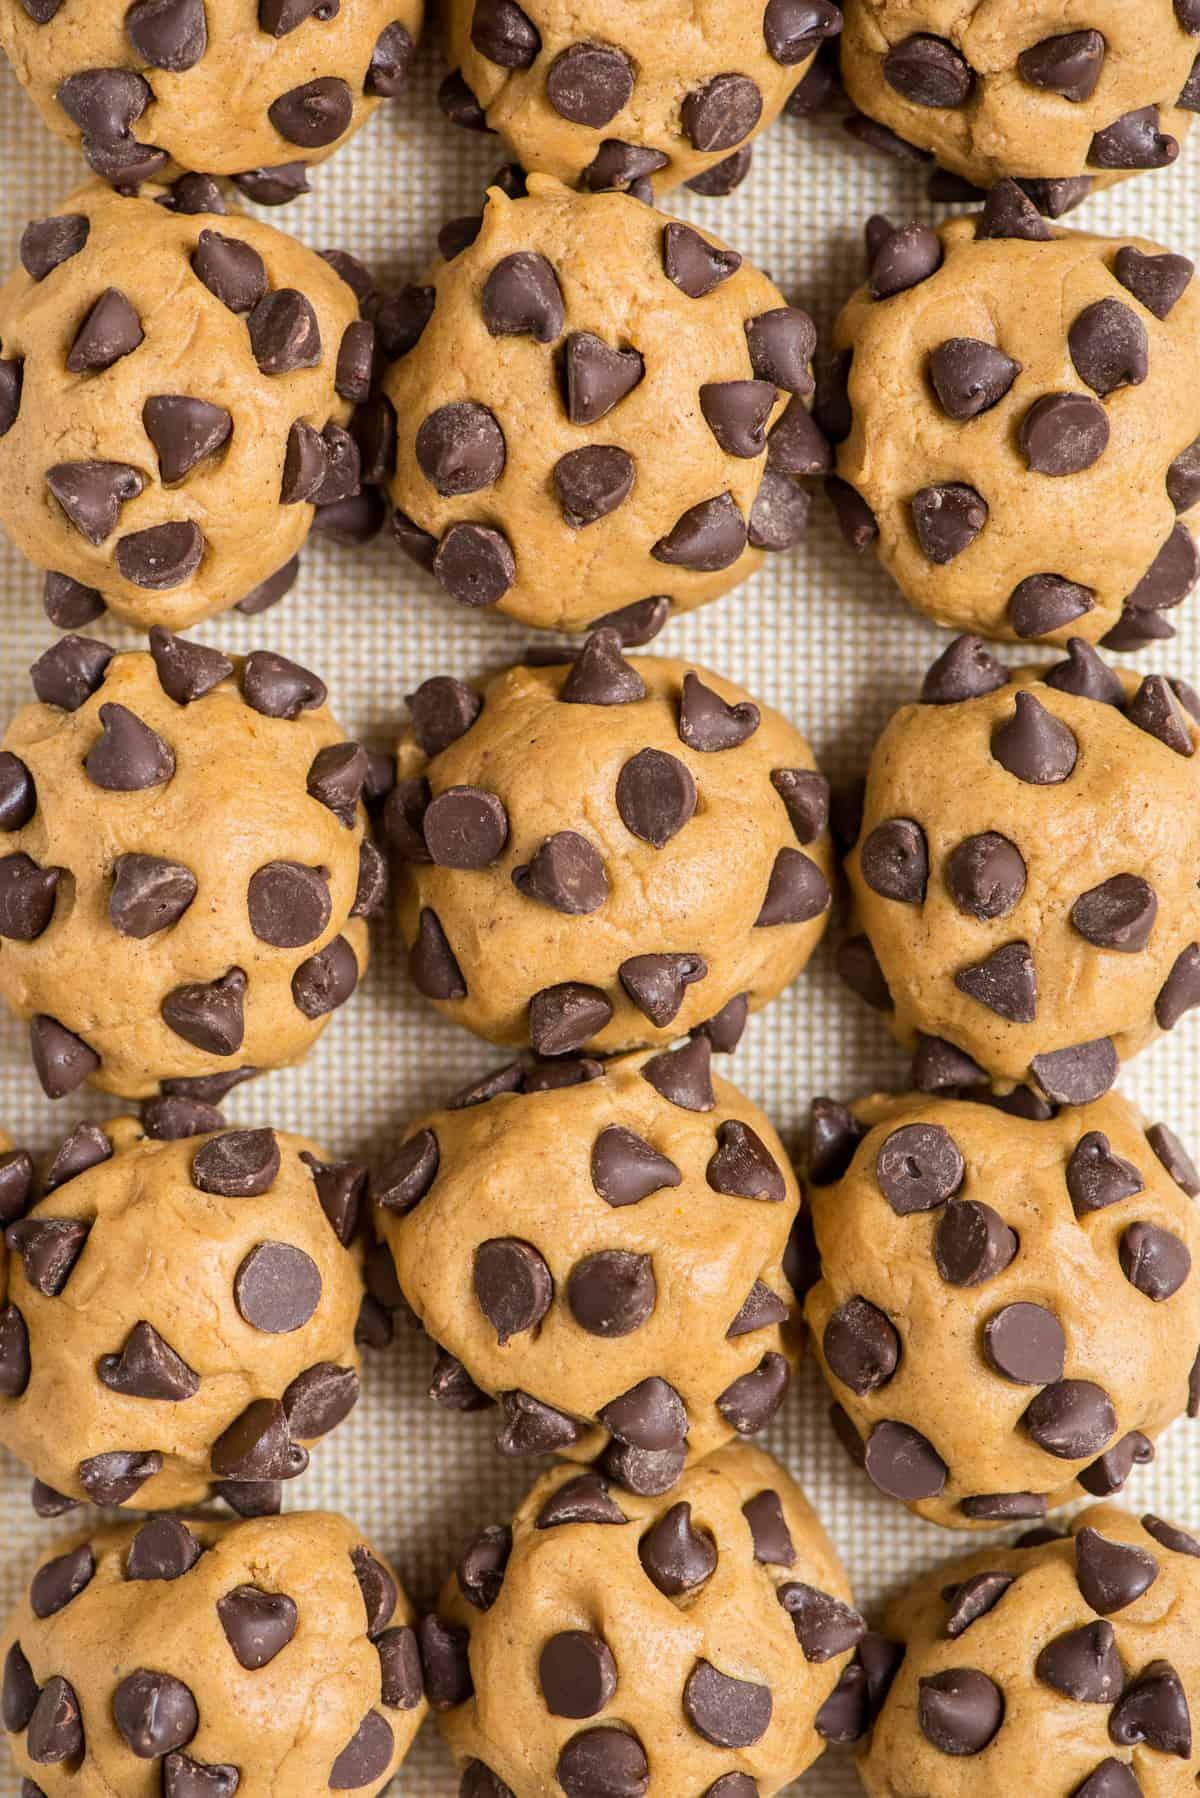 pumpkin chocolate chip cookie dough balls arranged in grid